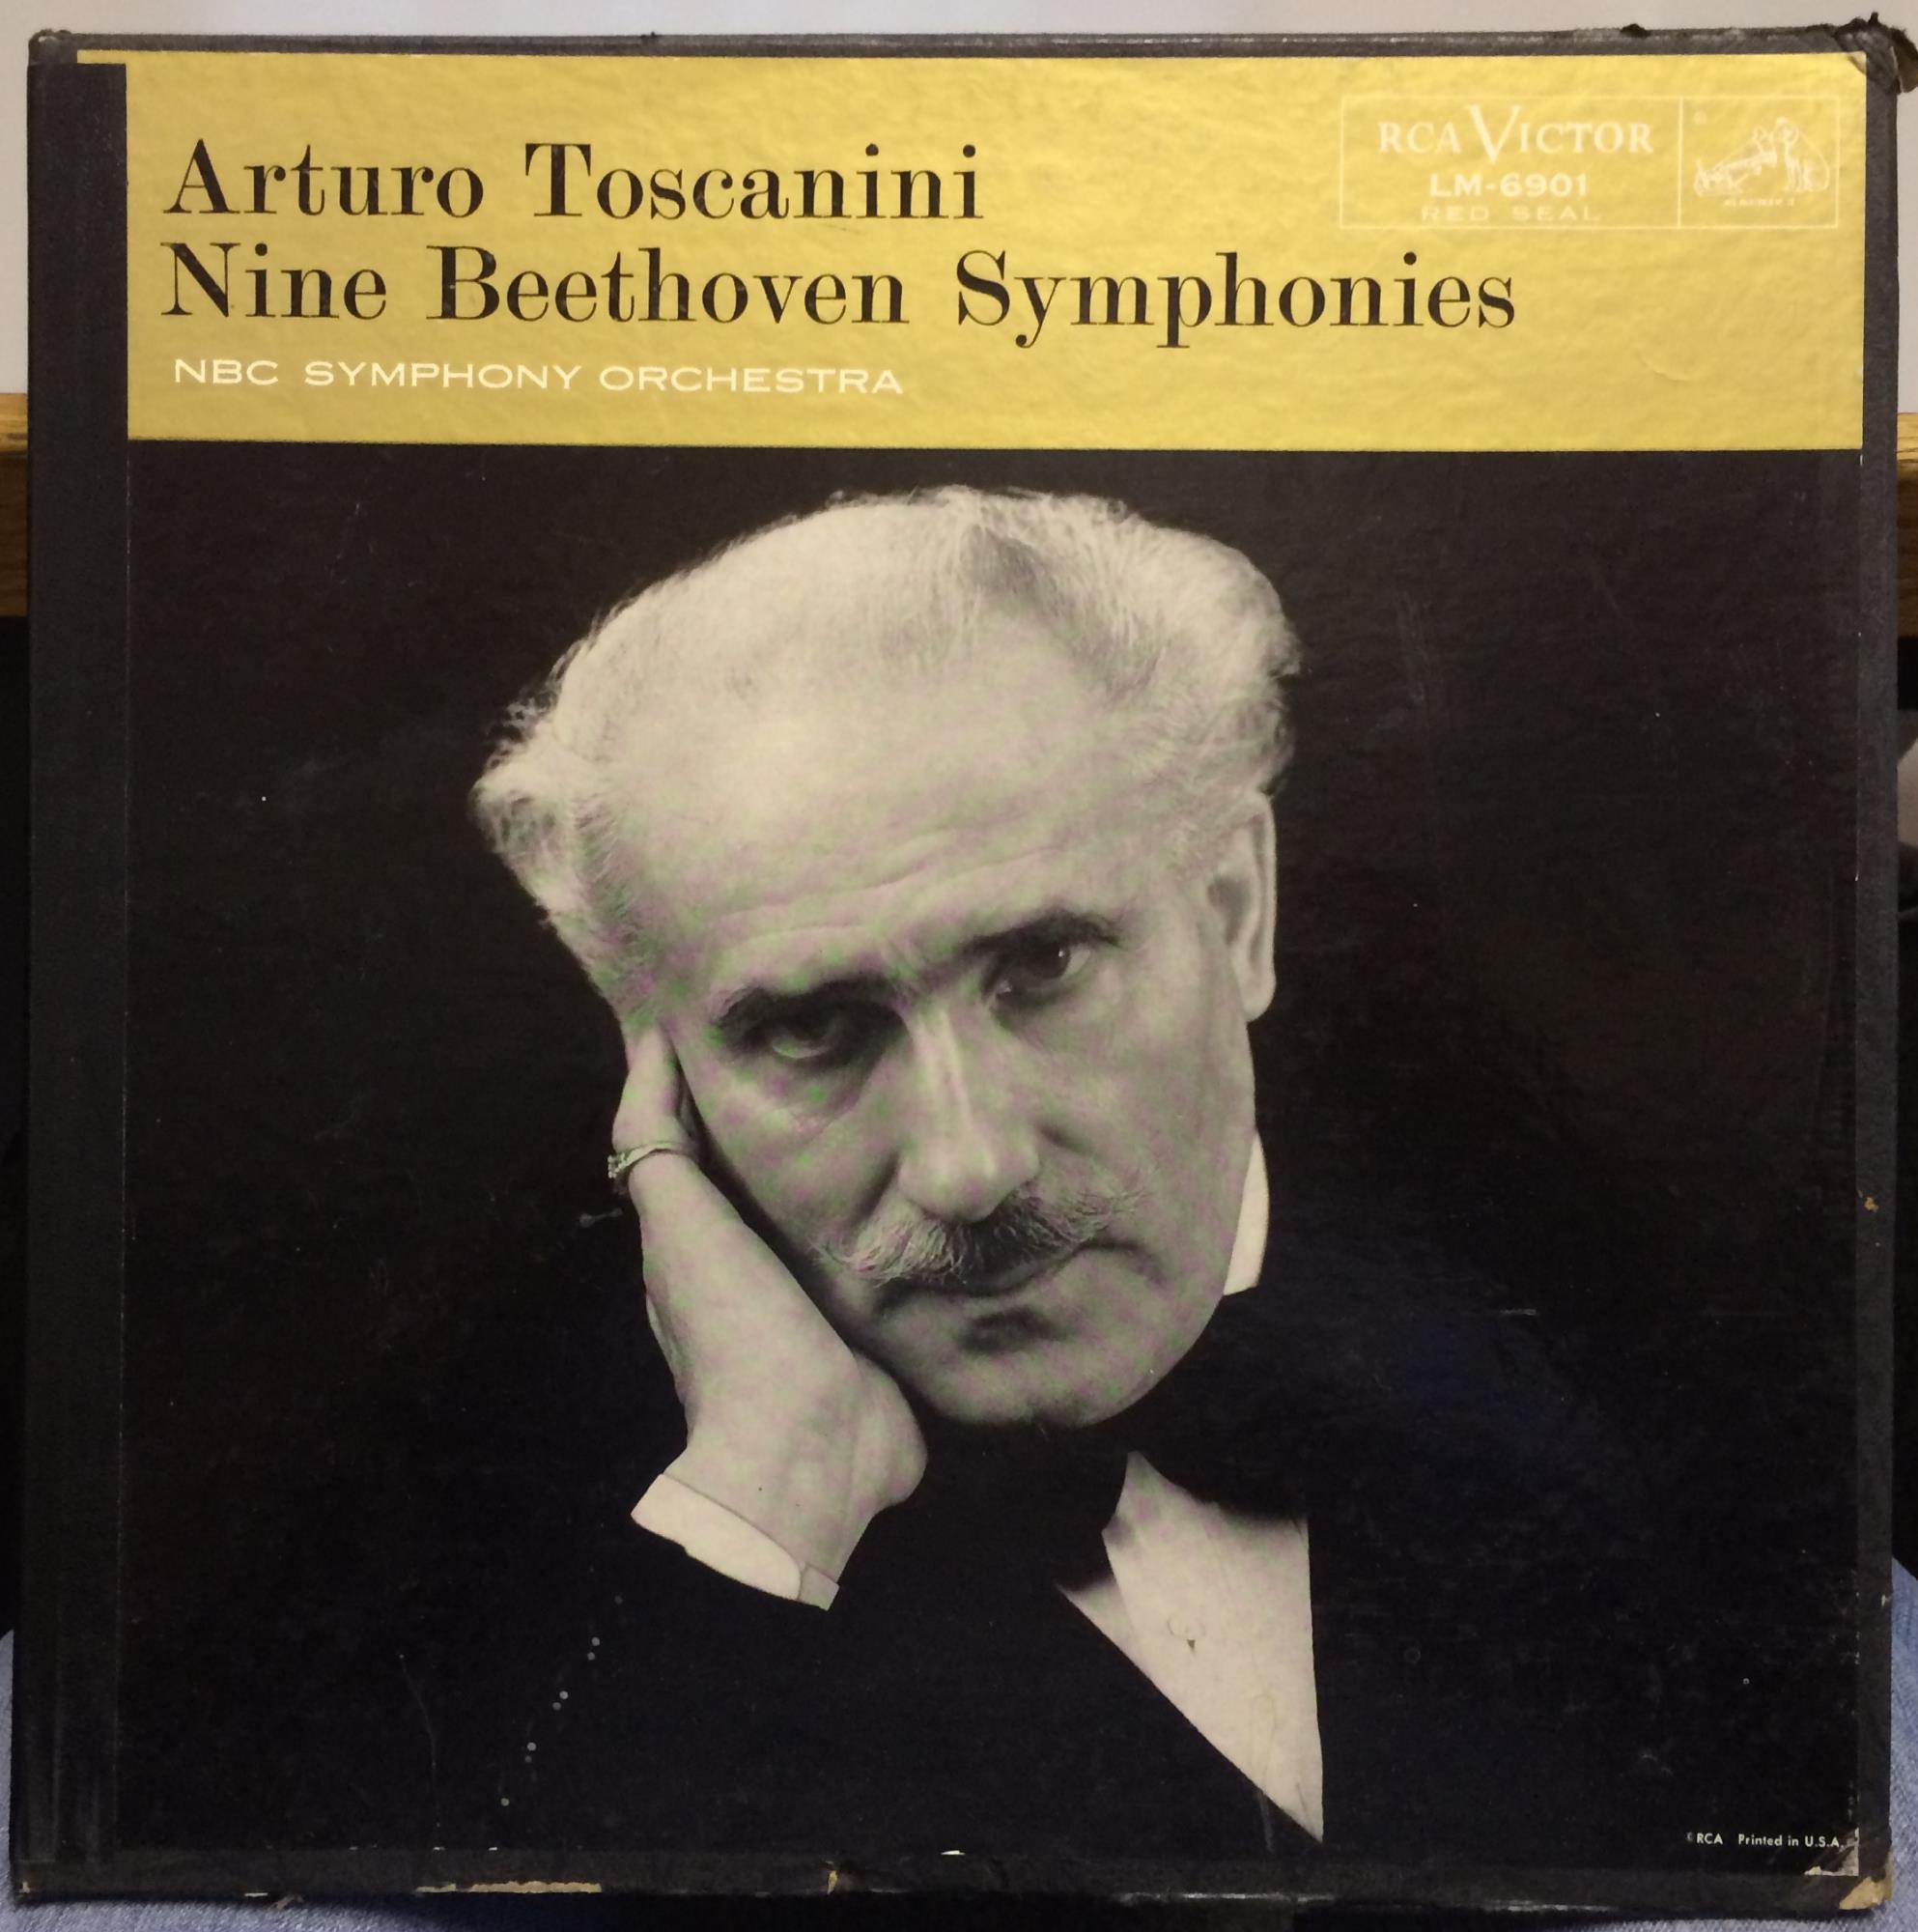 Arturo Toscanini , NBC Symphony Orchestra , Ferde Grofé* Grofe - Grand Canyon Suite